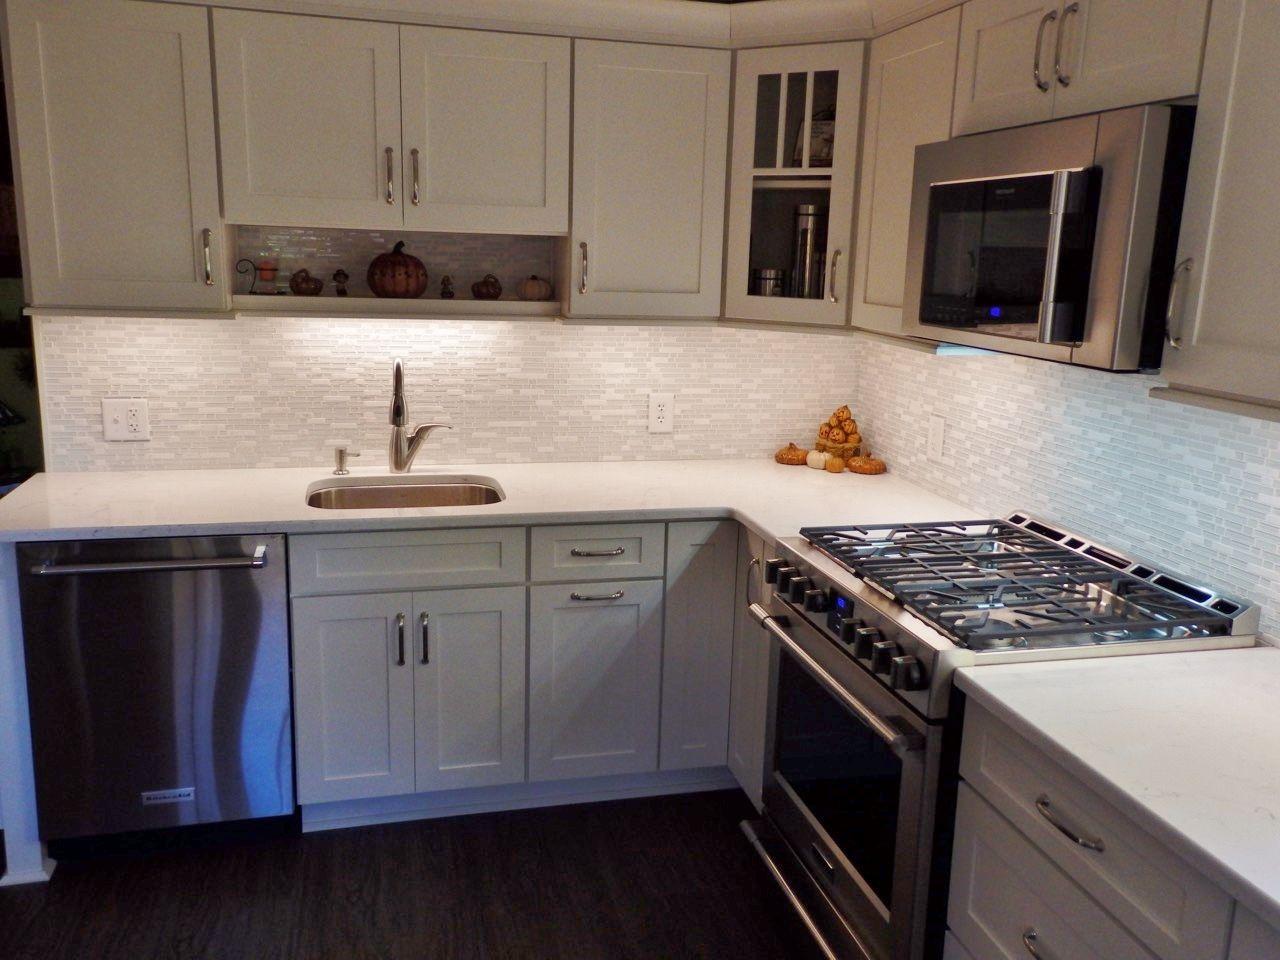 Pental quartz misterio engineered quartz countertops with a white glass and stone mosaic tile backsplash white kitchen by stoneshop from cherry hill nj